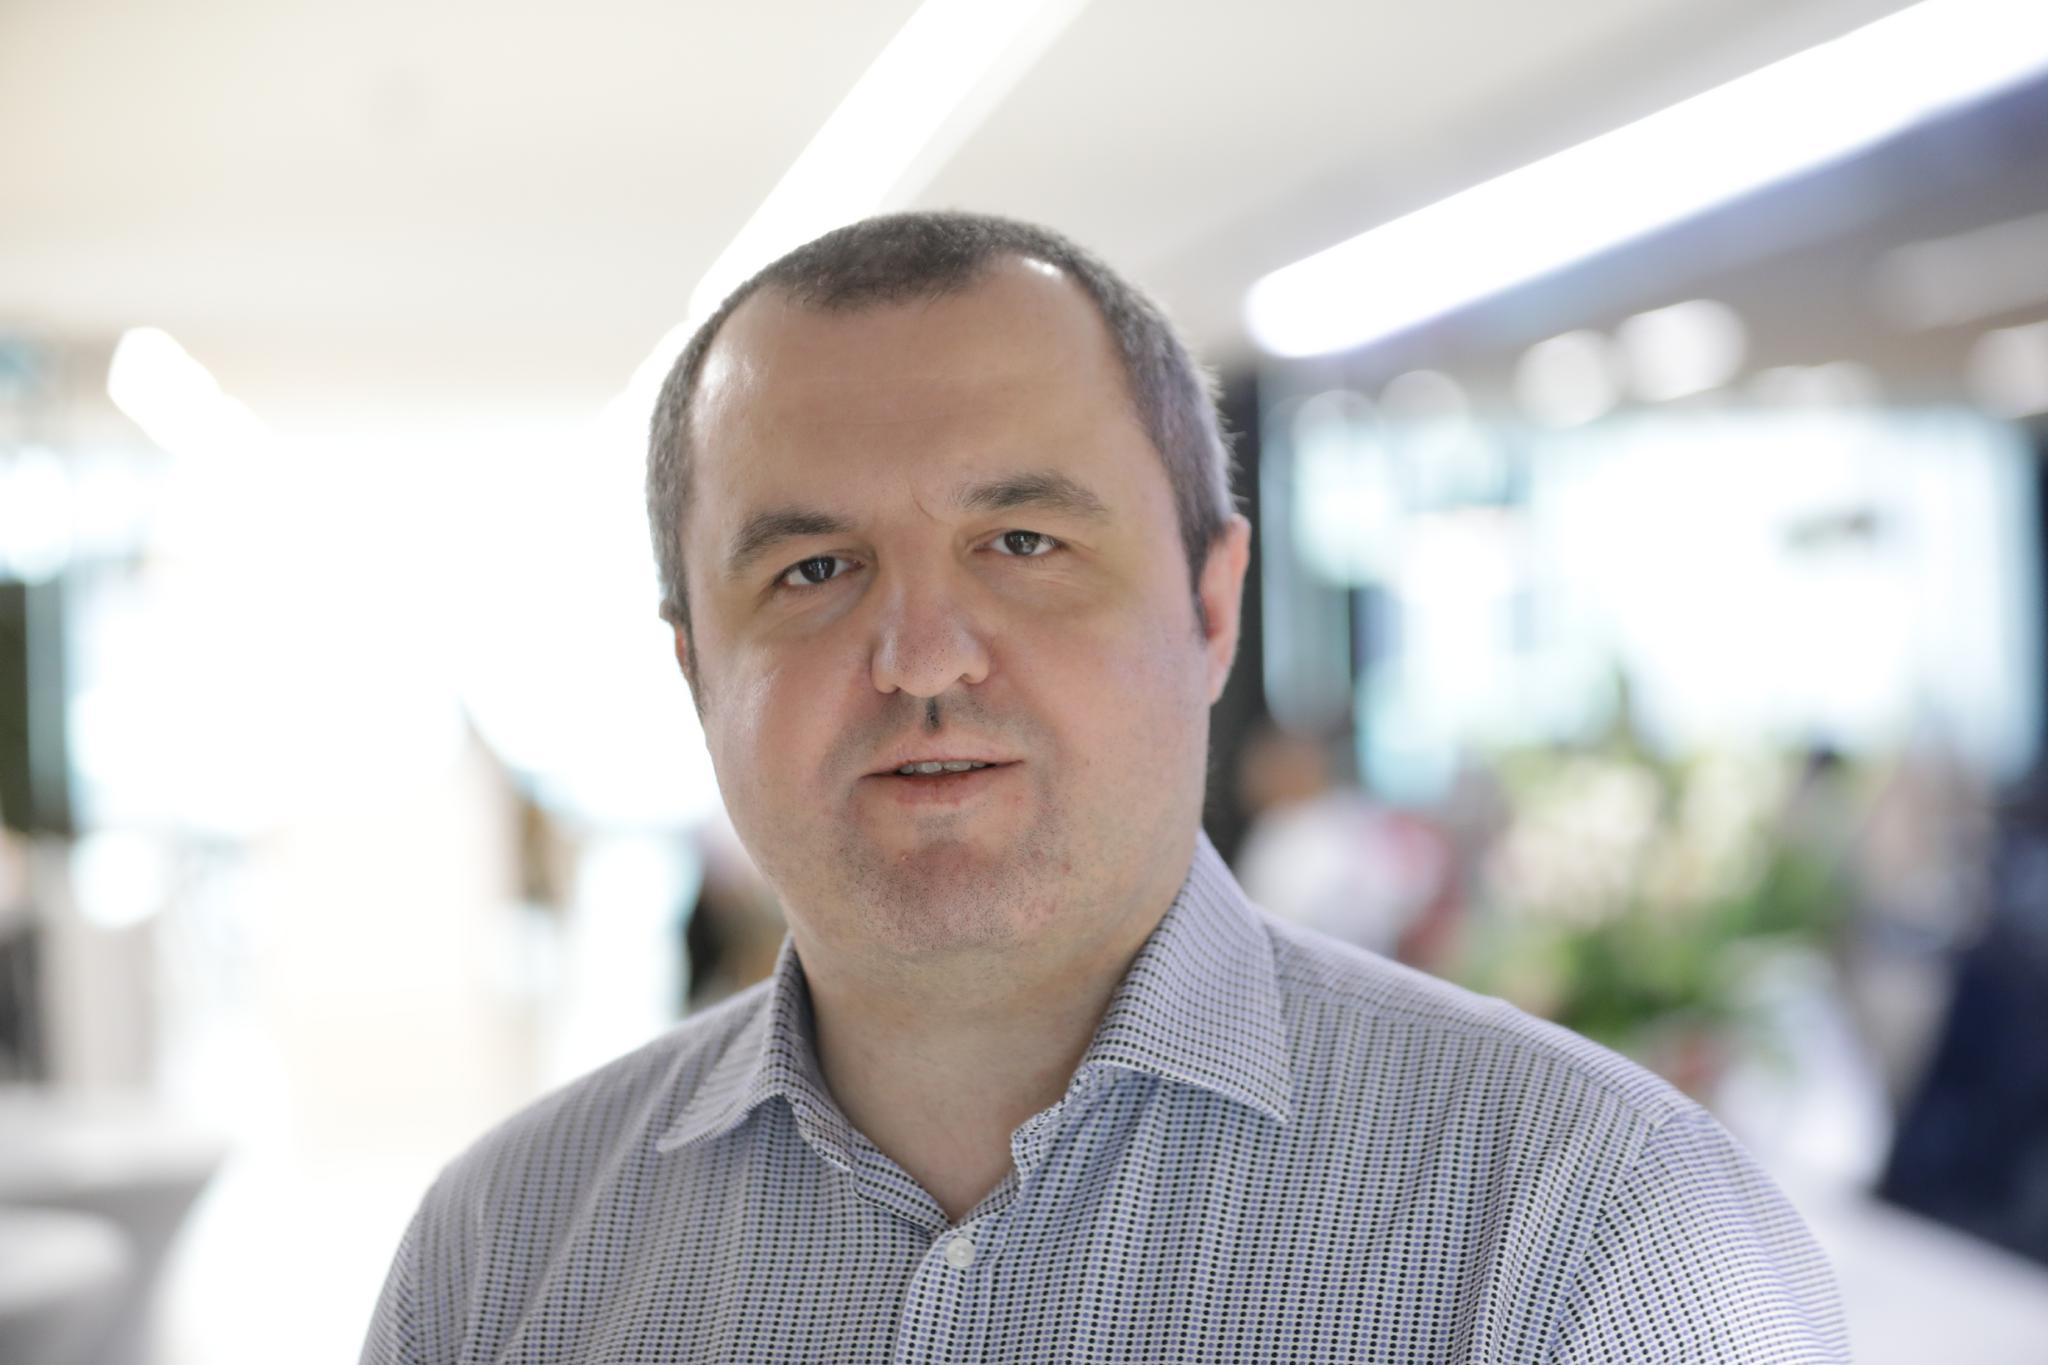 Andre Balasian